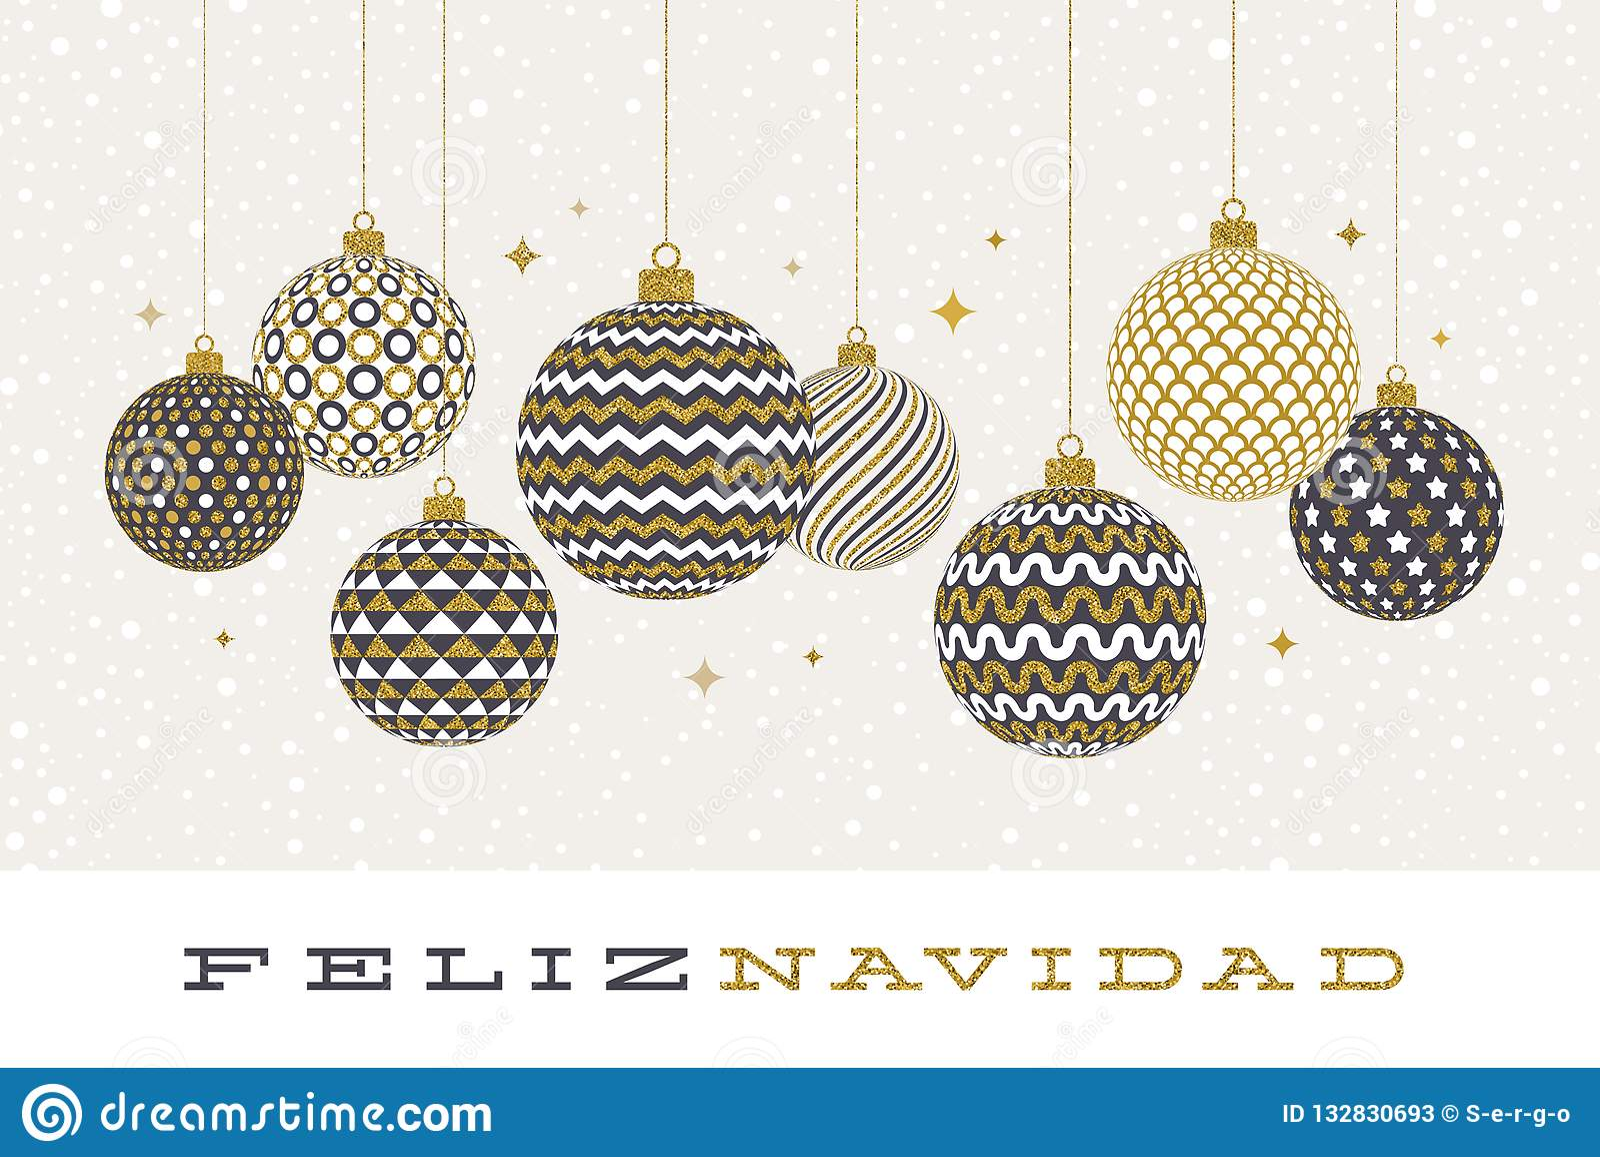 Christmas Wishes In Spanish.Feliz Navidad Christmas Greetings In Spanish Patterned